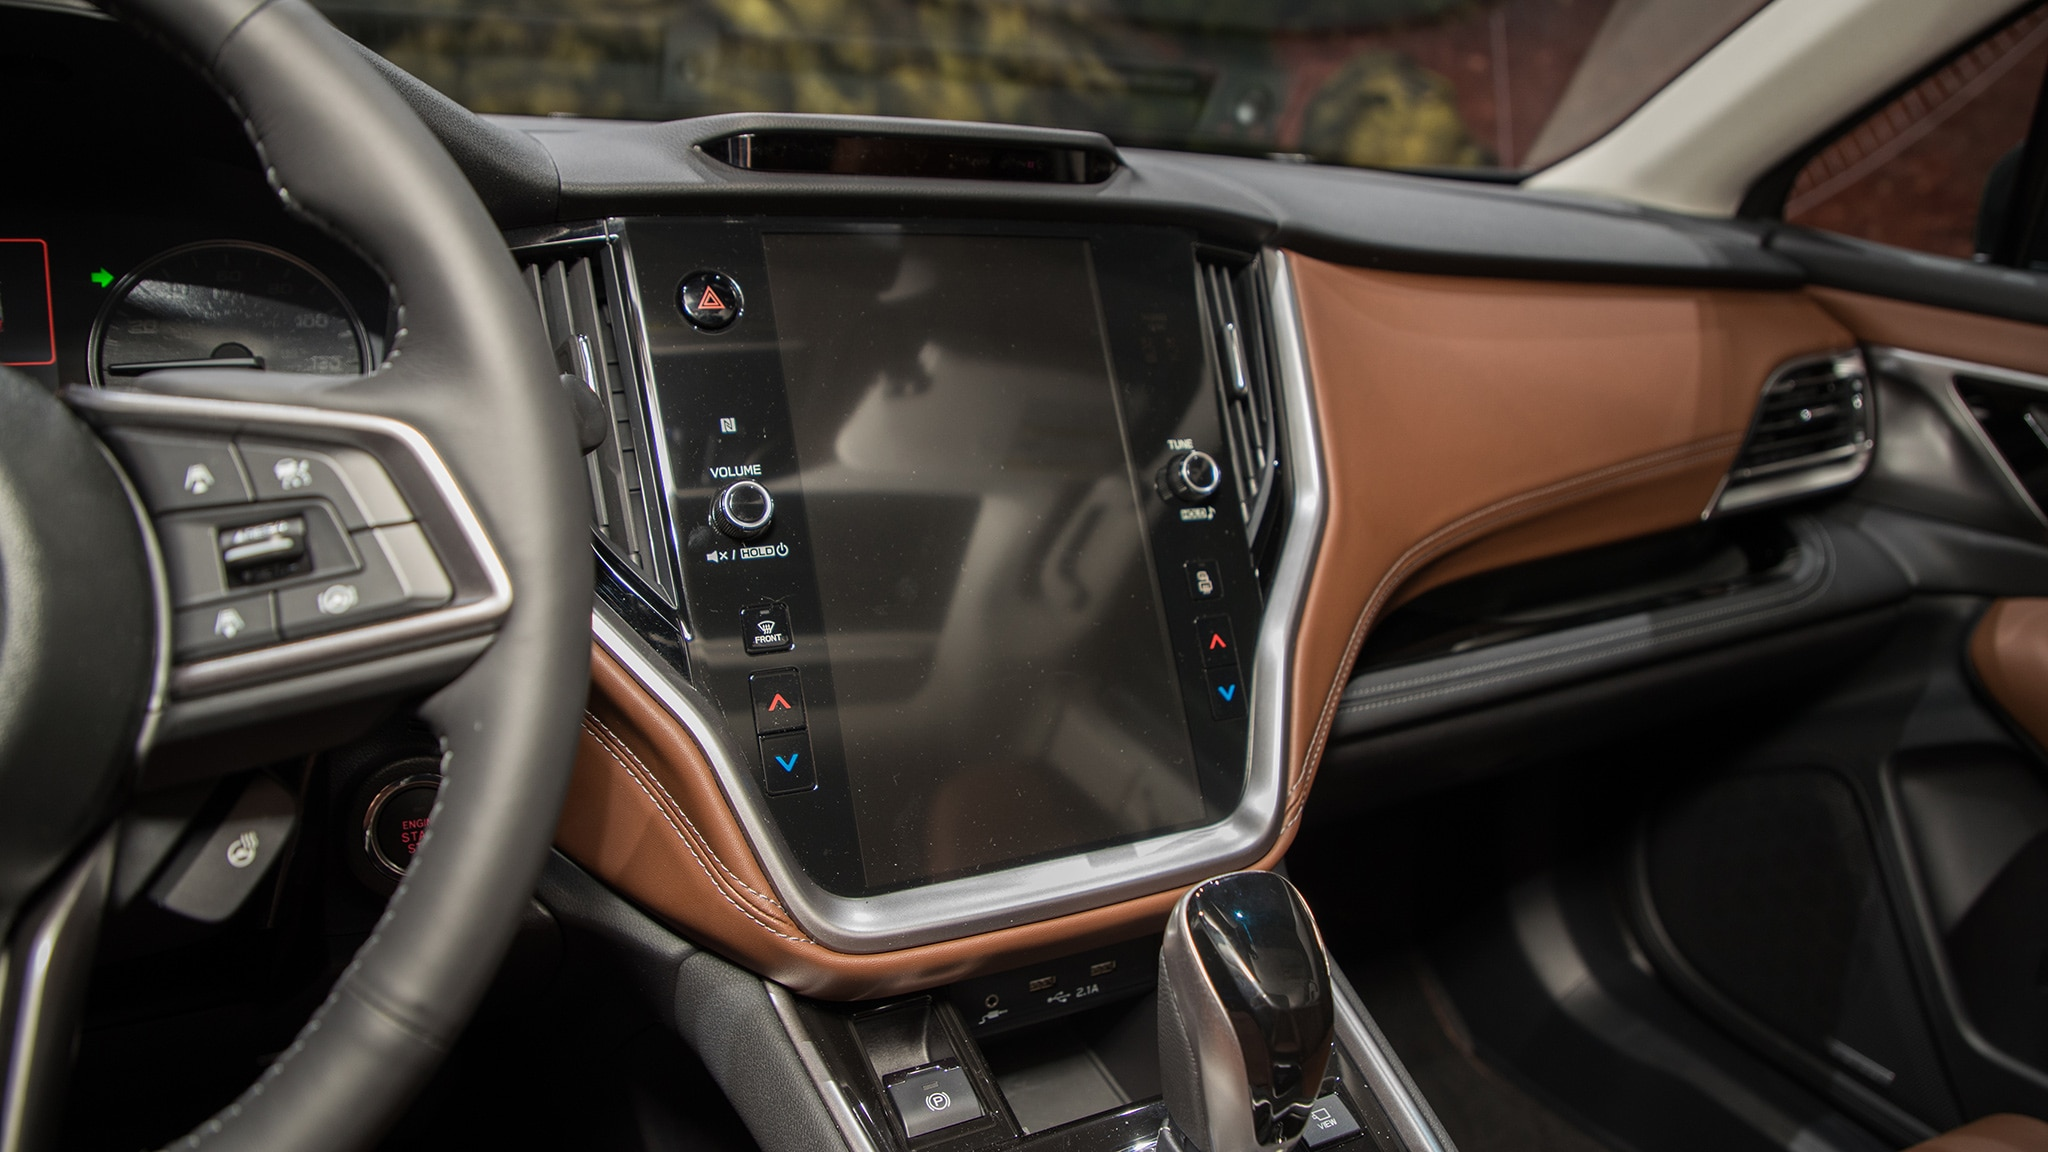 2020 Subaru Outback Interior Screen Motor Trend En Espanol